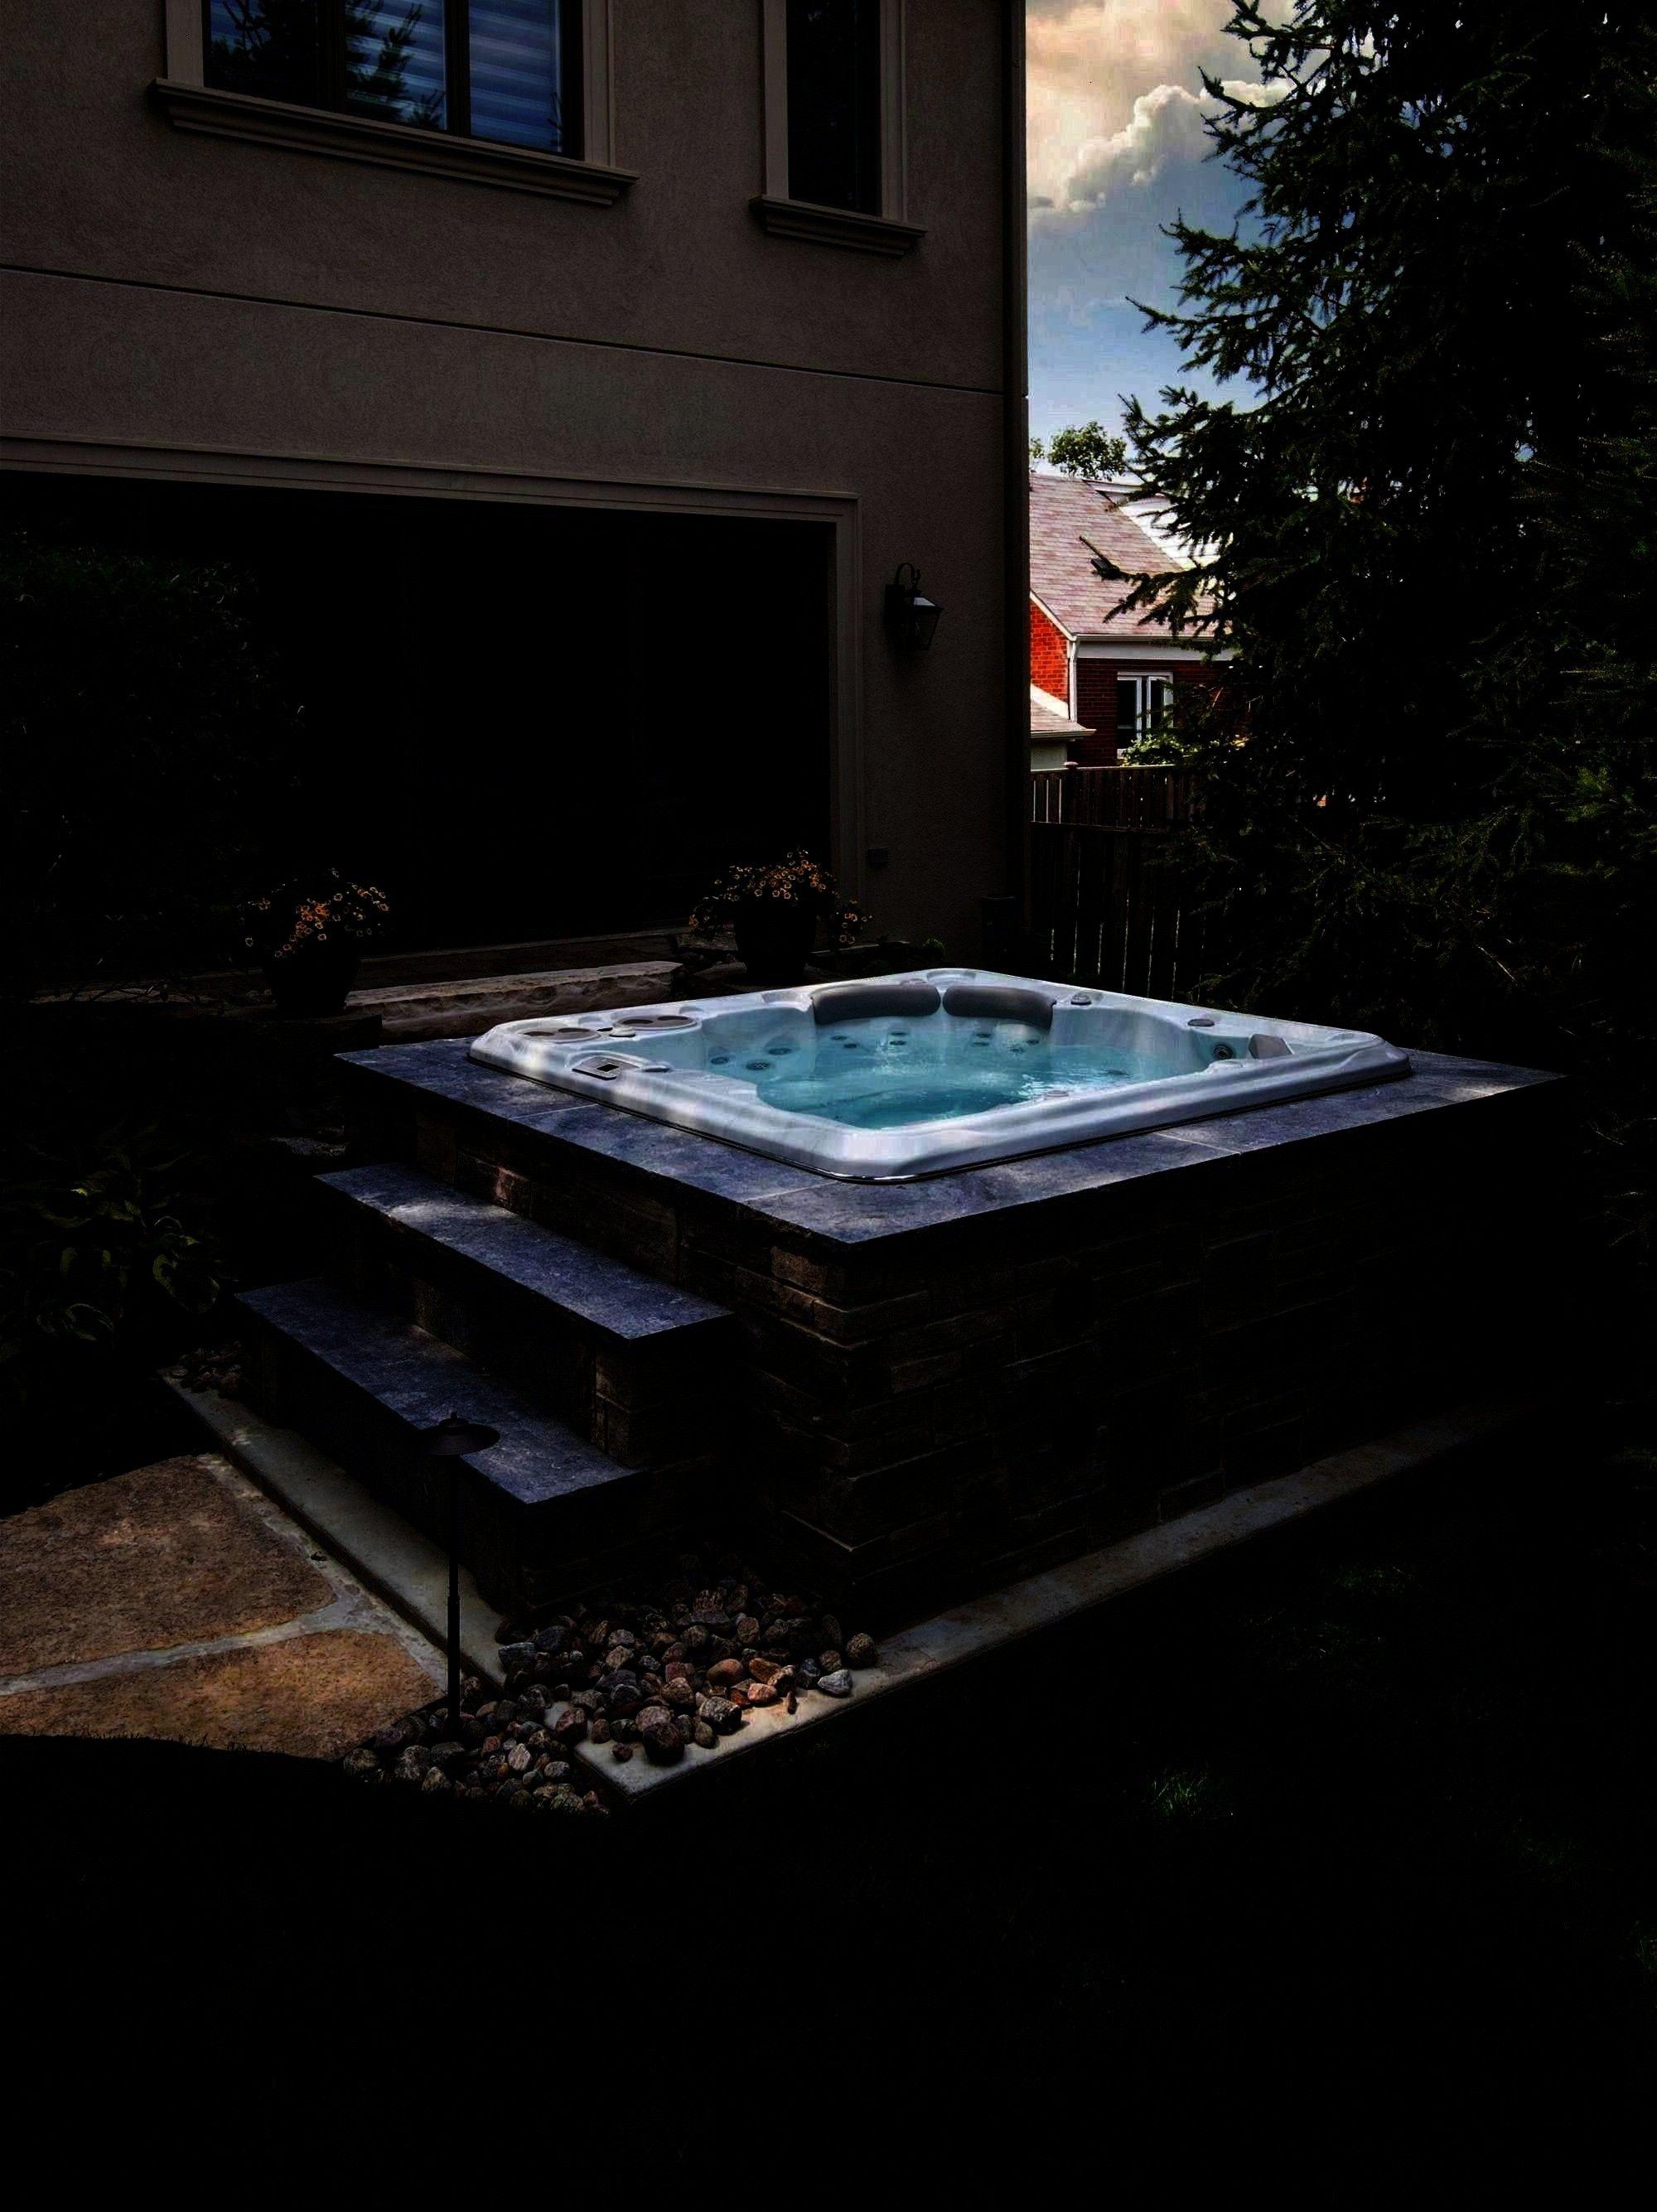 Estateinstall Createground Doesntluxury Installed Luxurytub